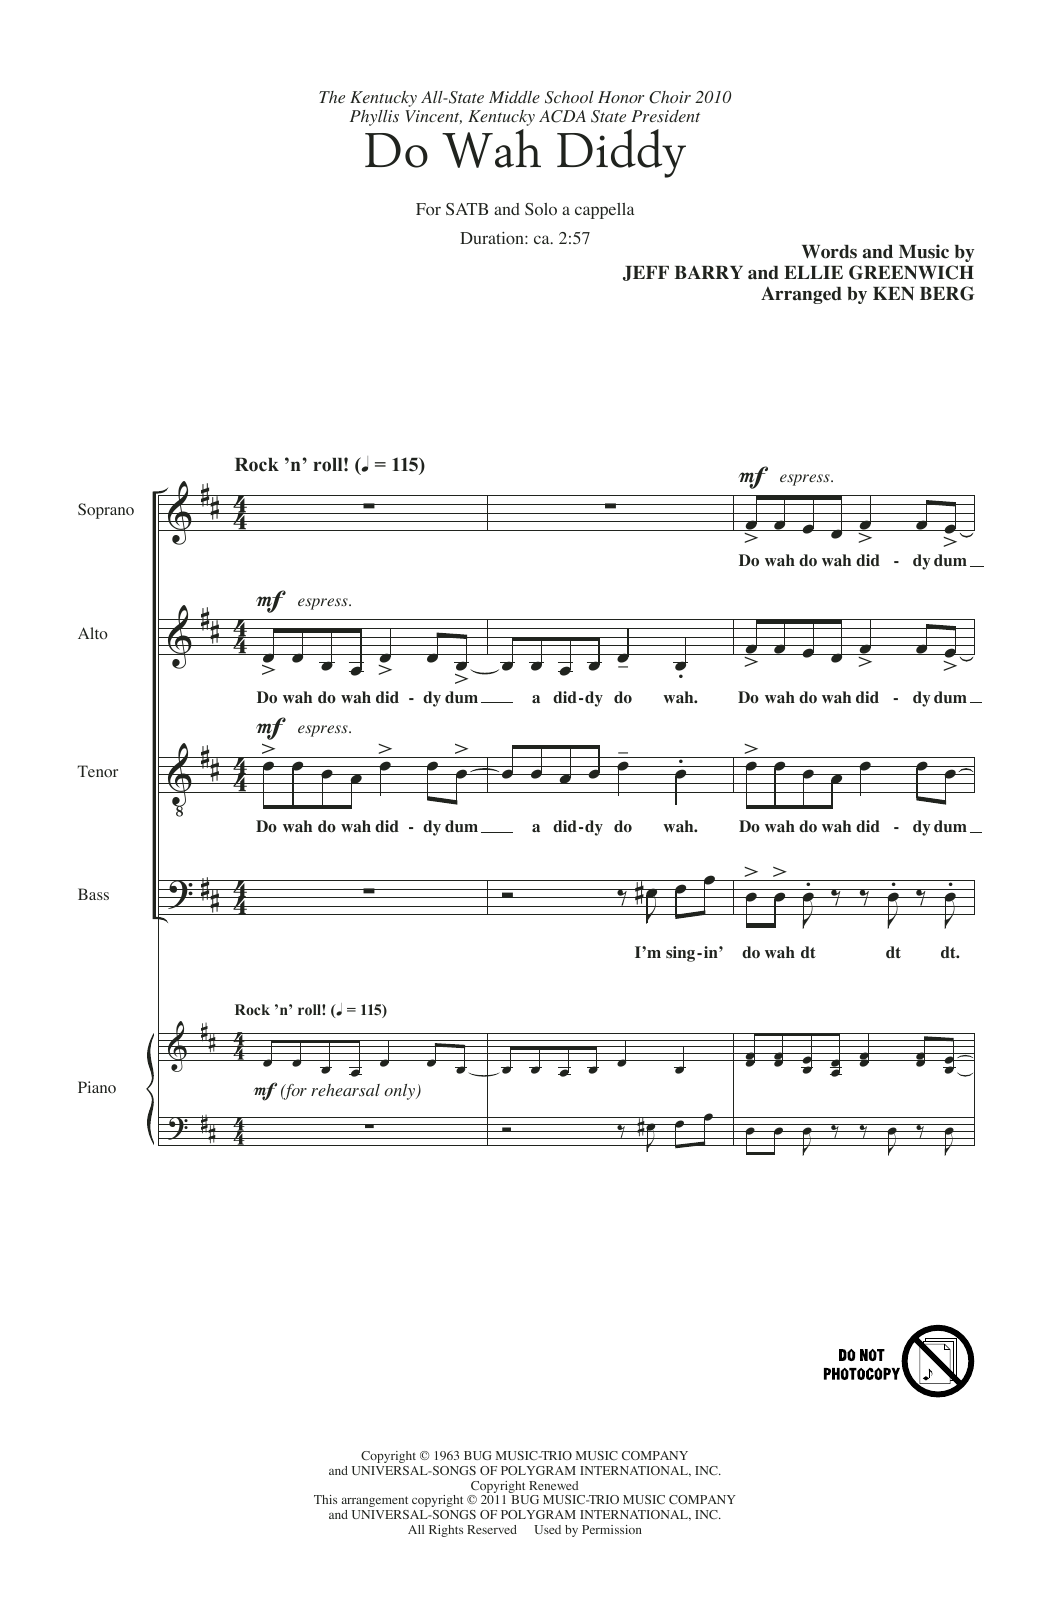 Do Wah Diddy Diddy (arr. Ken Berg) (Choir)